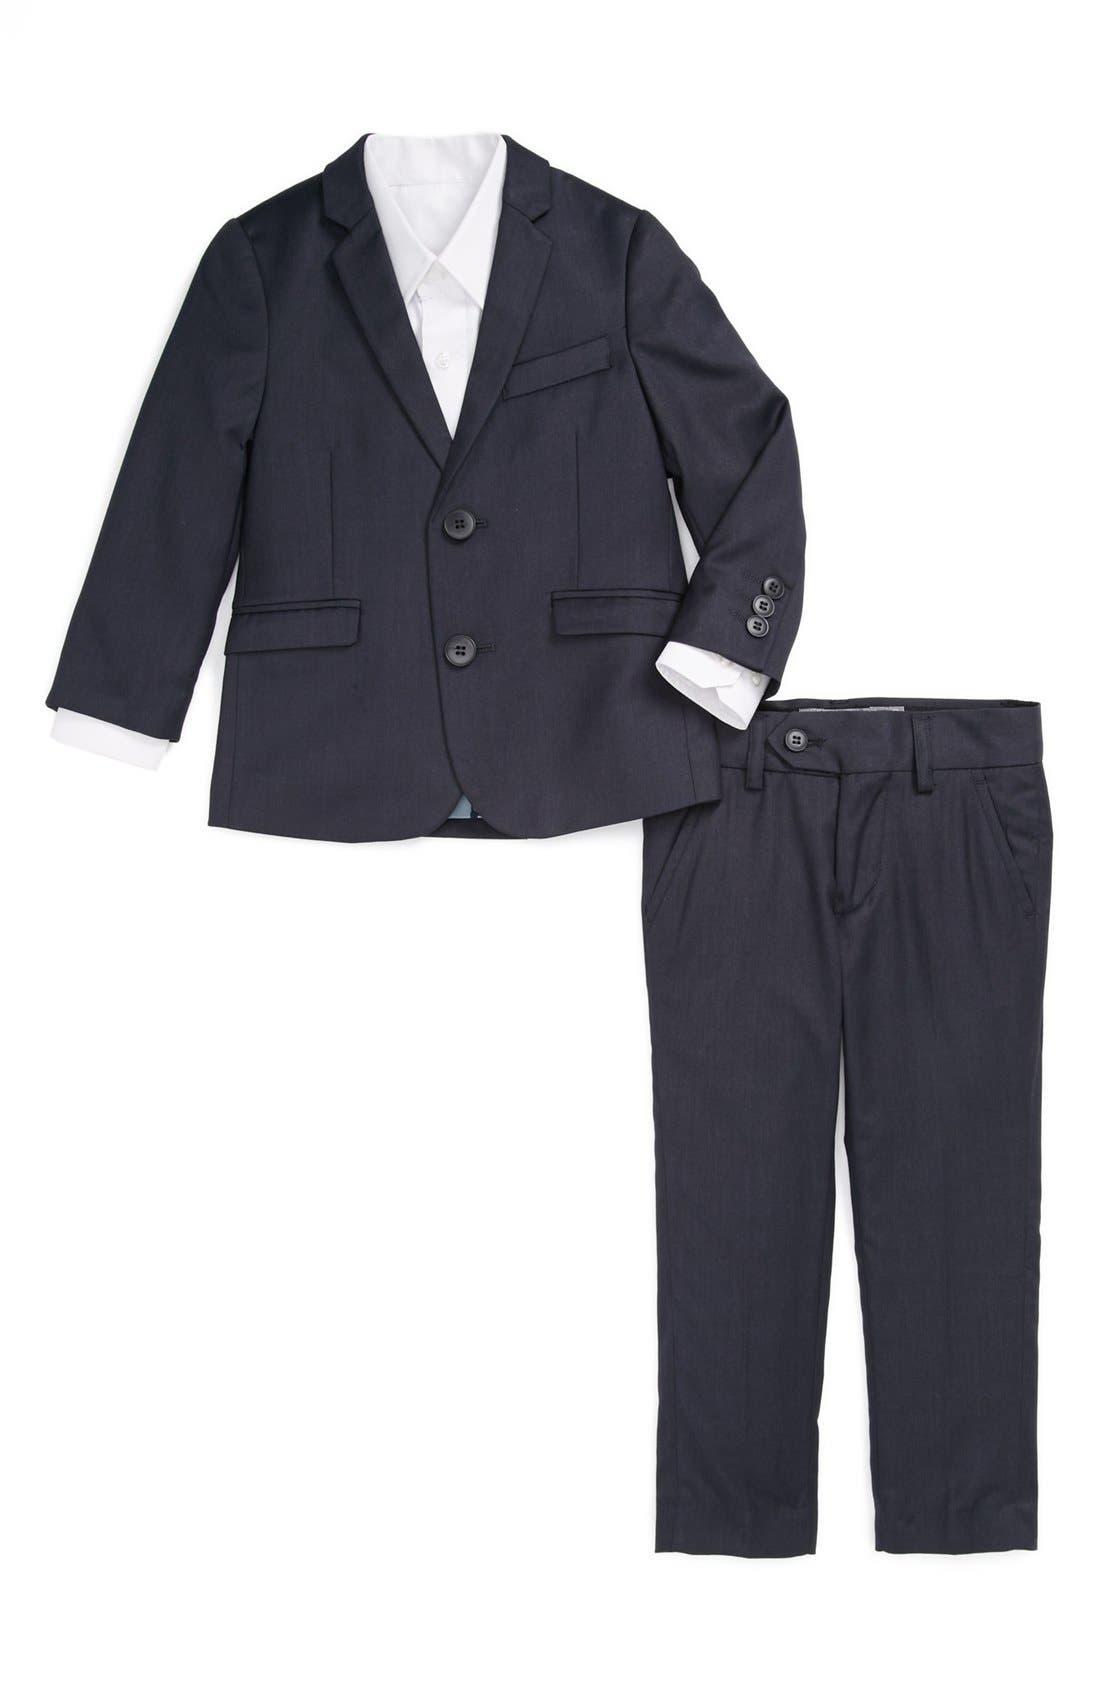 Alternate Image 1 Selected - Appaman 'Mod' Suit (Toddler Boys)